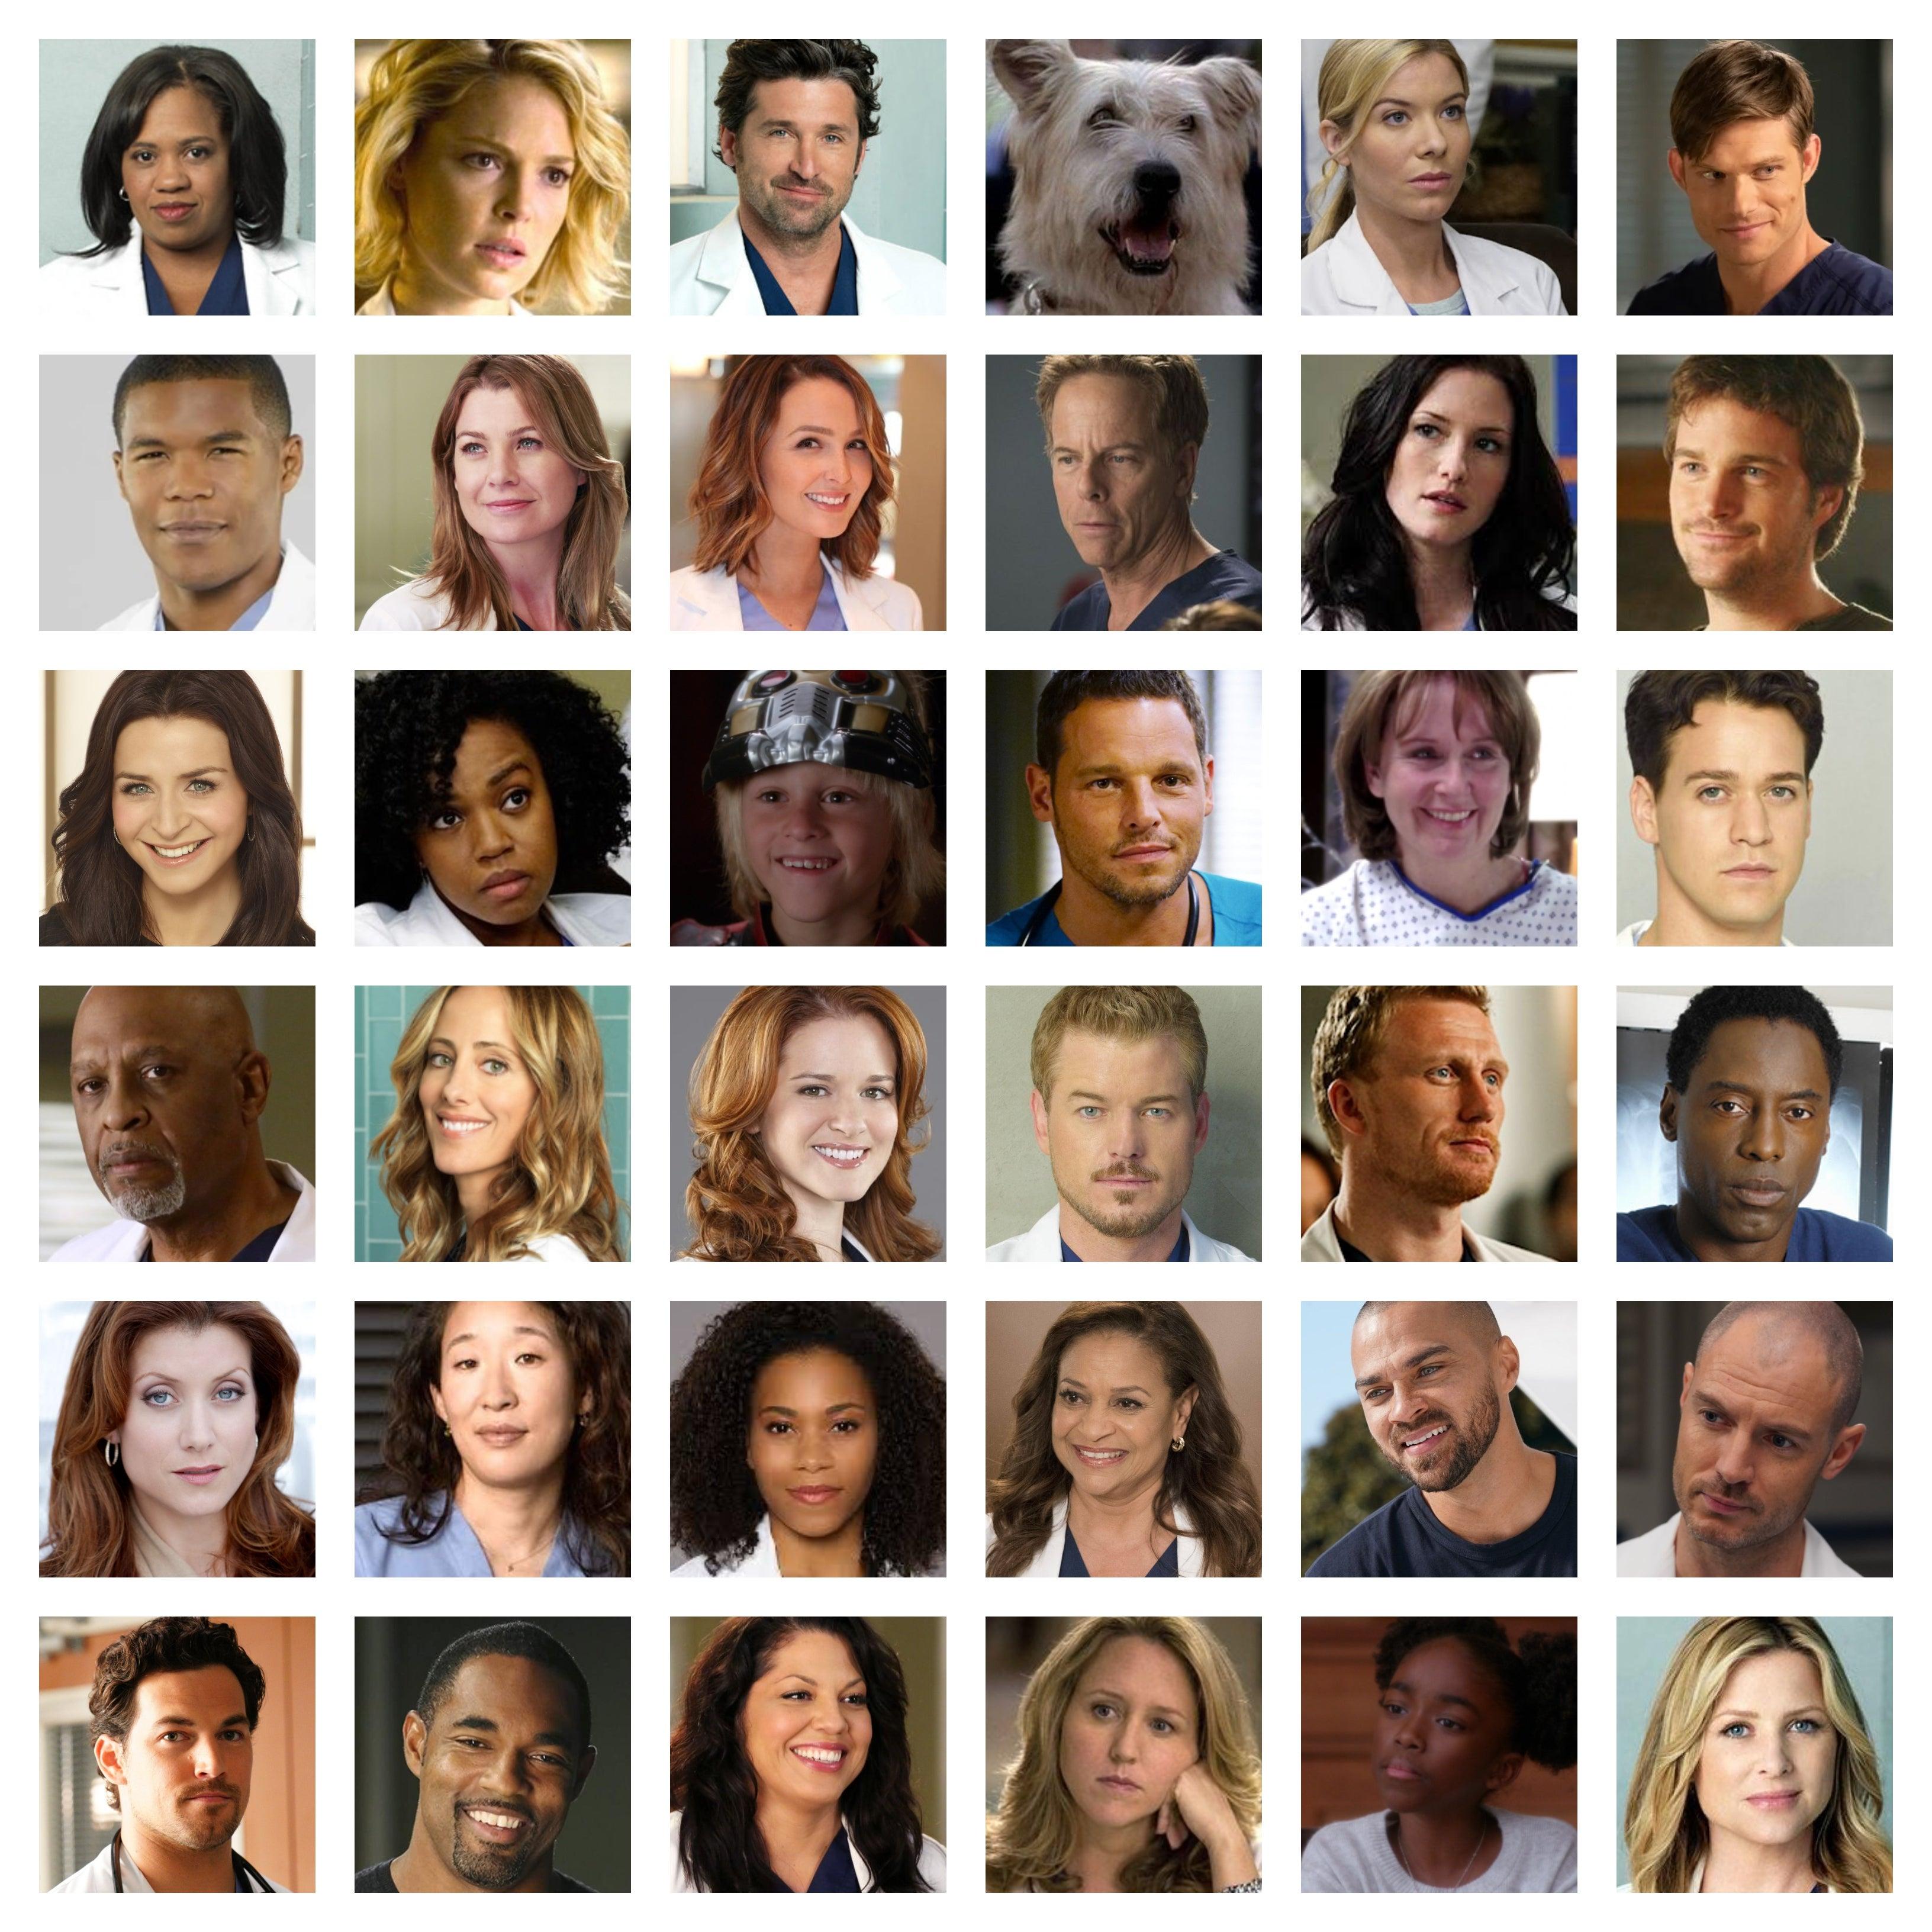 Greys anatomy cast list